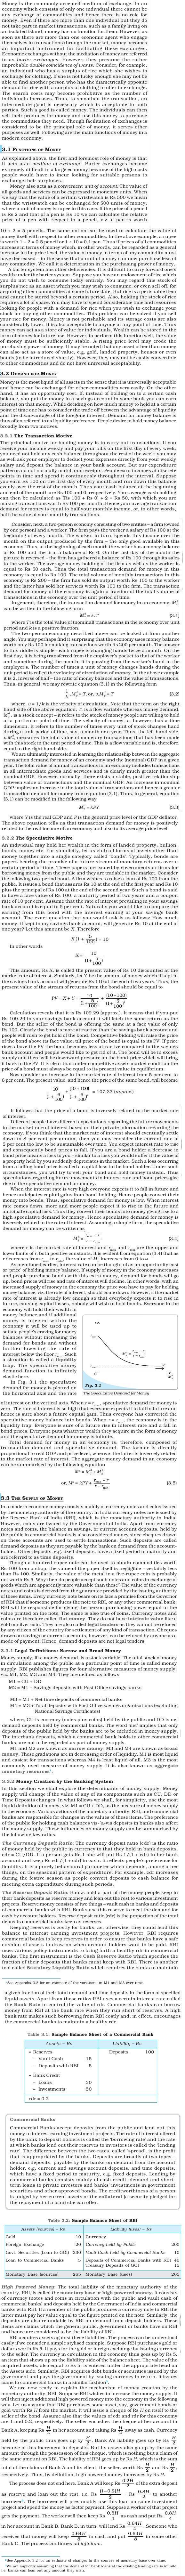 NCERT Class XII Economics Macroeconomics - Money and Banking